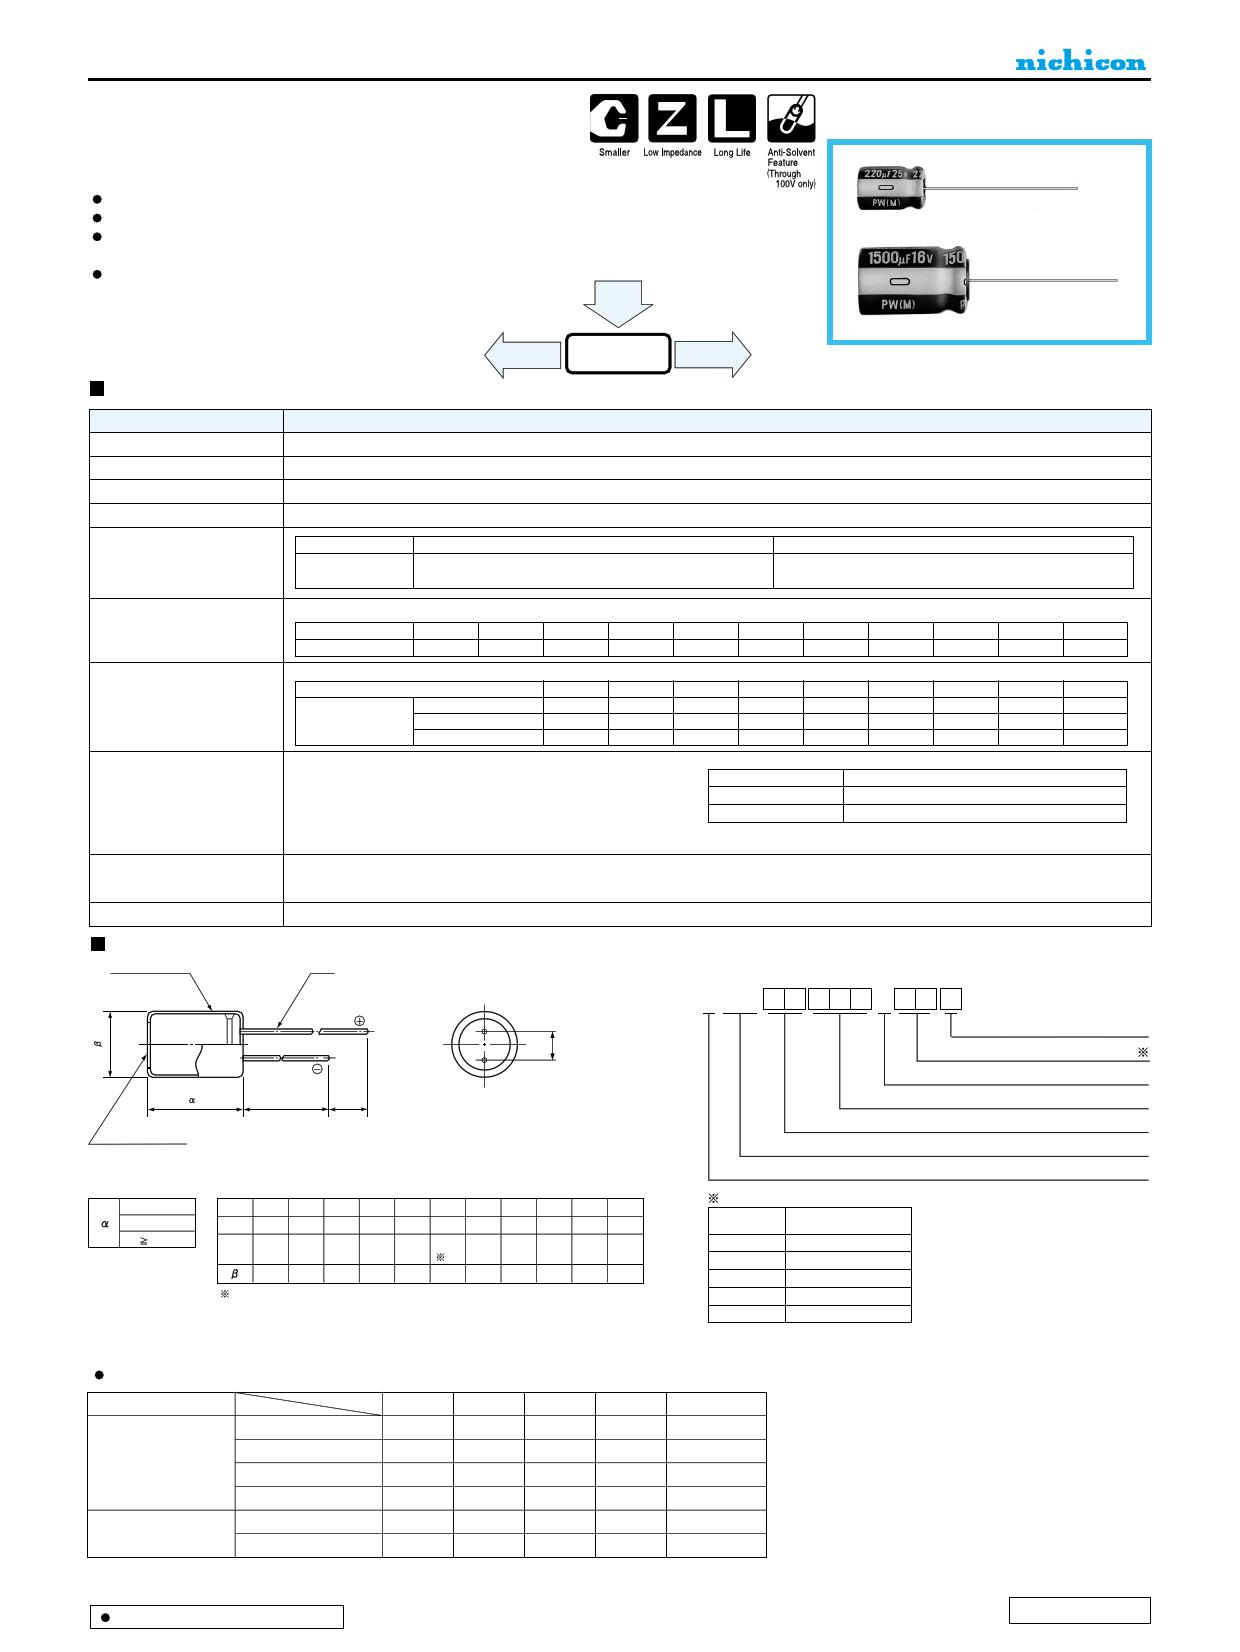 UPW1C222MHH 데이터시트 및 UPW1C222MHH PDF